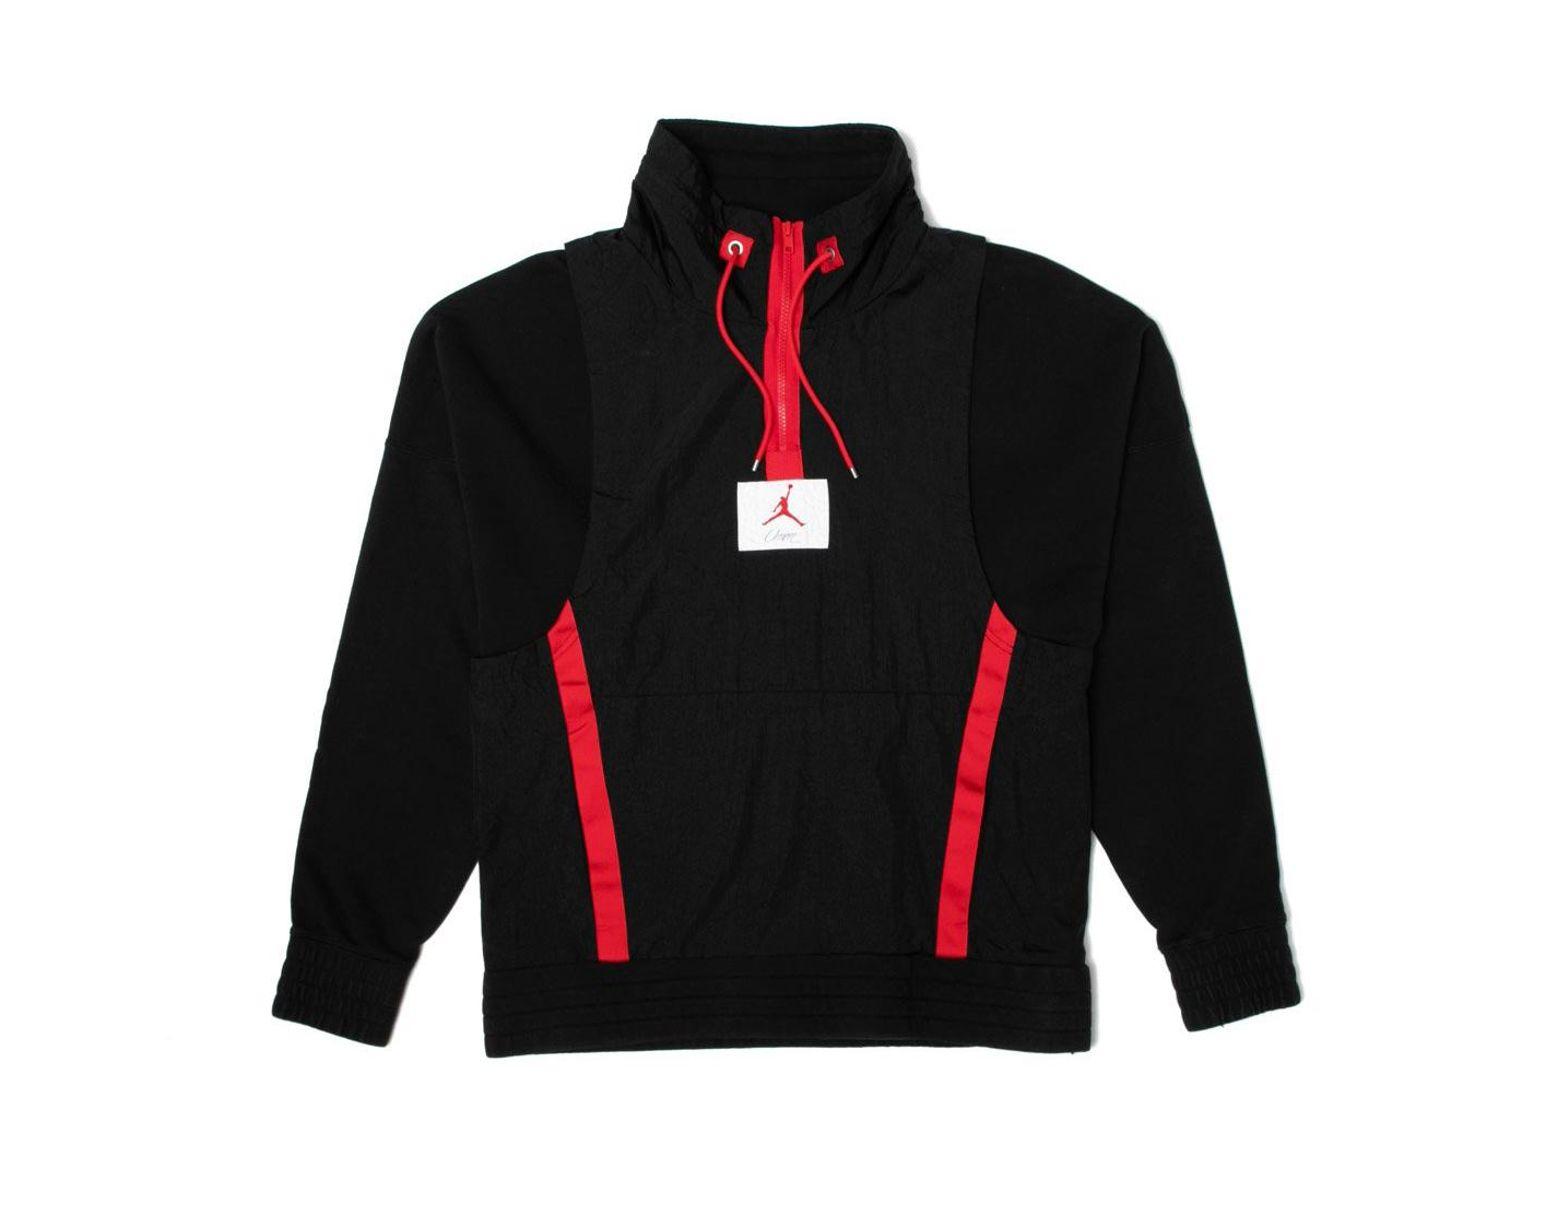 d6615861 Nike X Union Nrg Vault Aj Flight 1/2 Zip Jacket Black in Black for Men -  Lyst